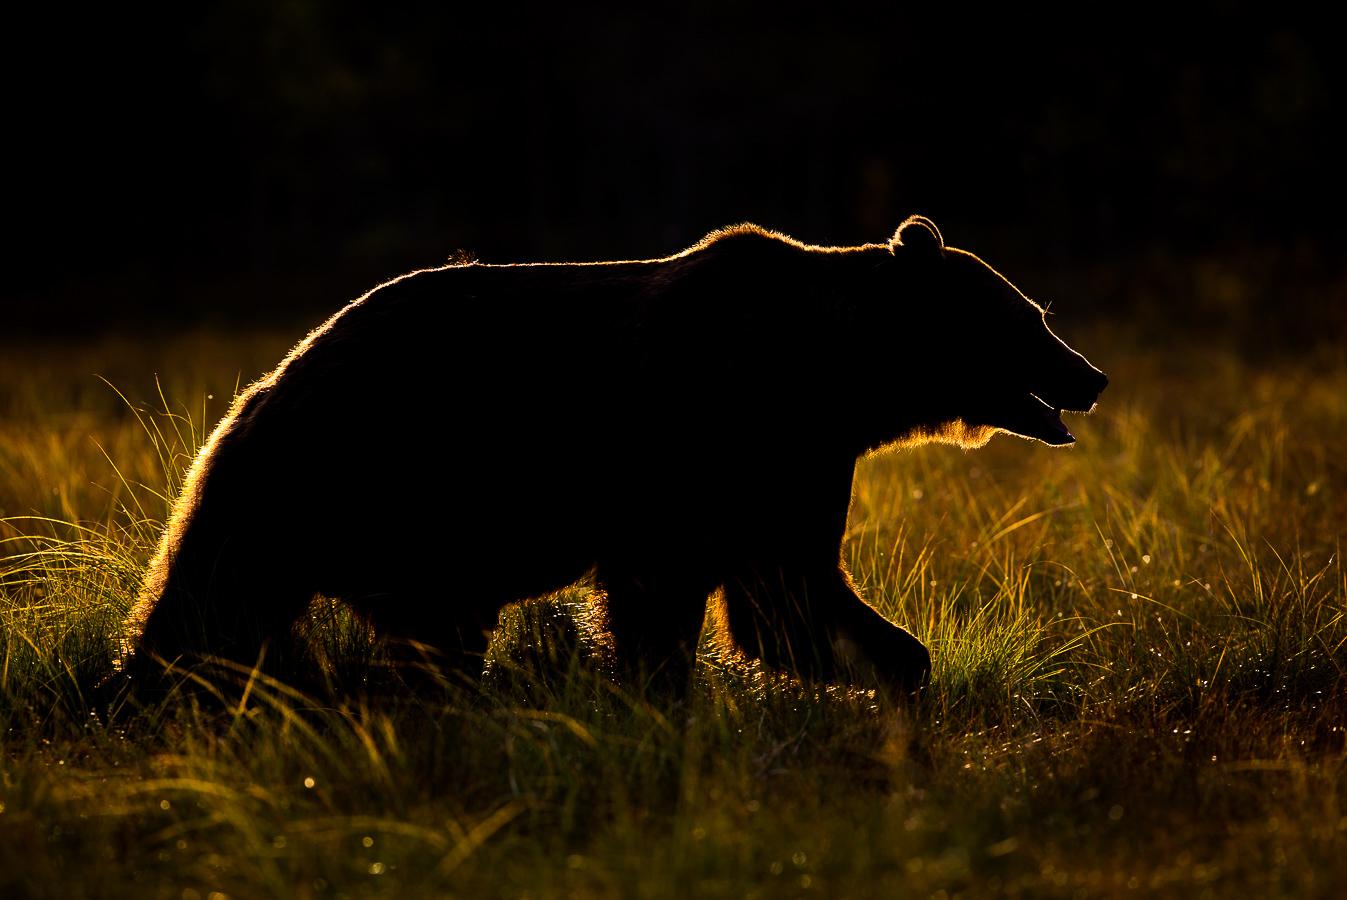 Brown bear photography tour Finland-3.jpg